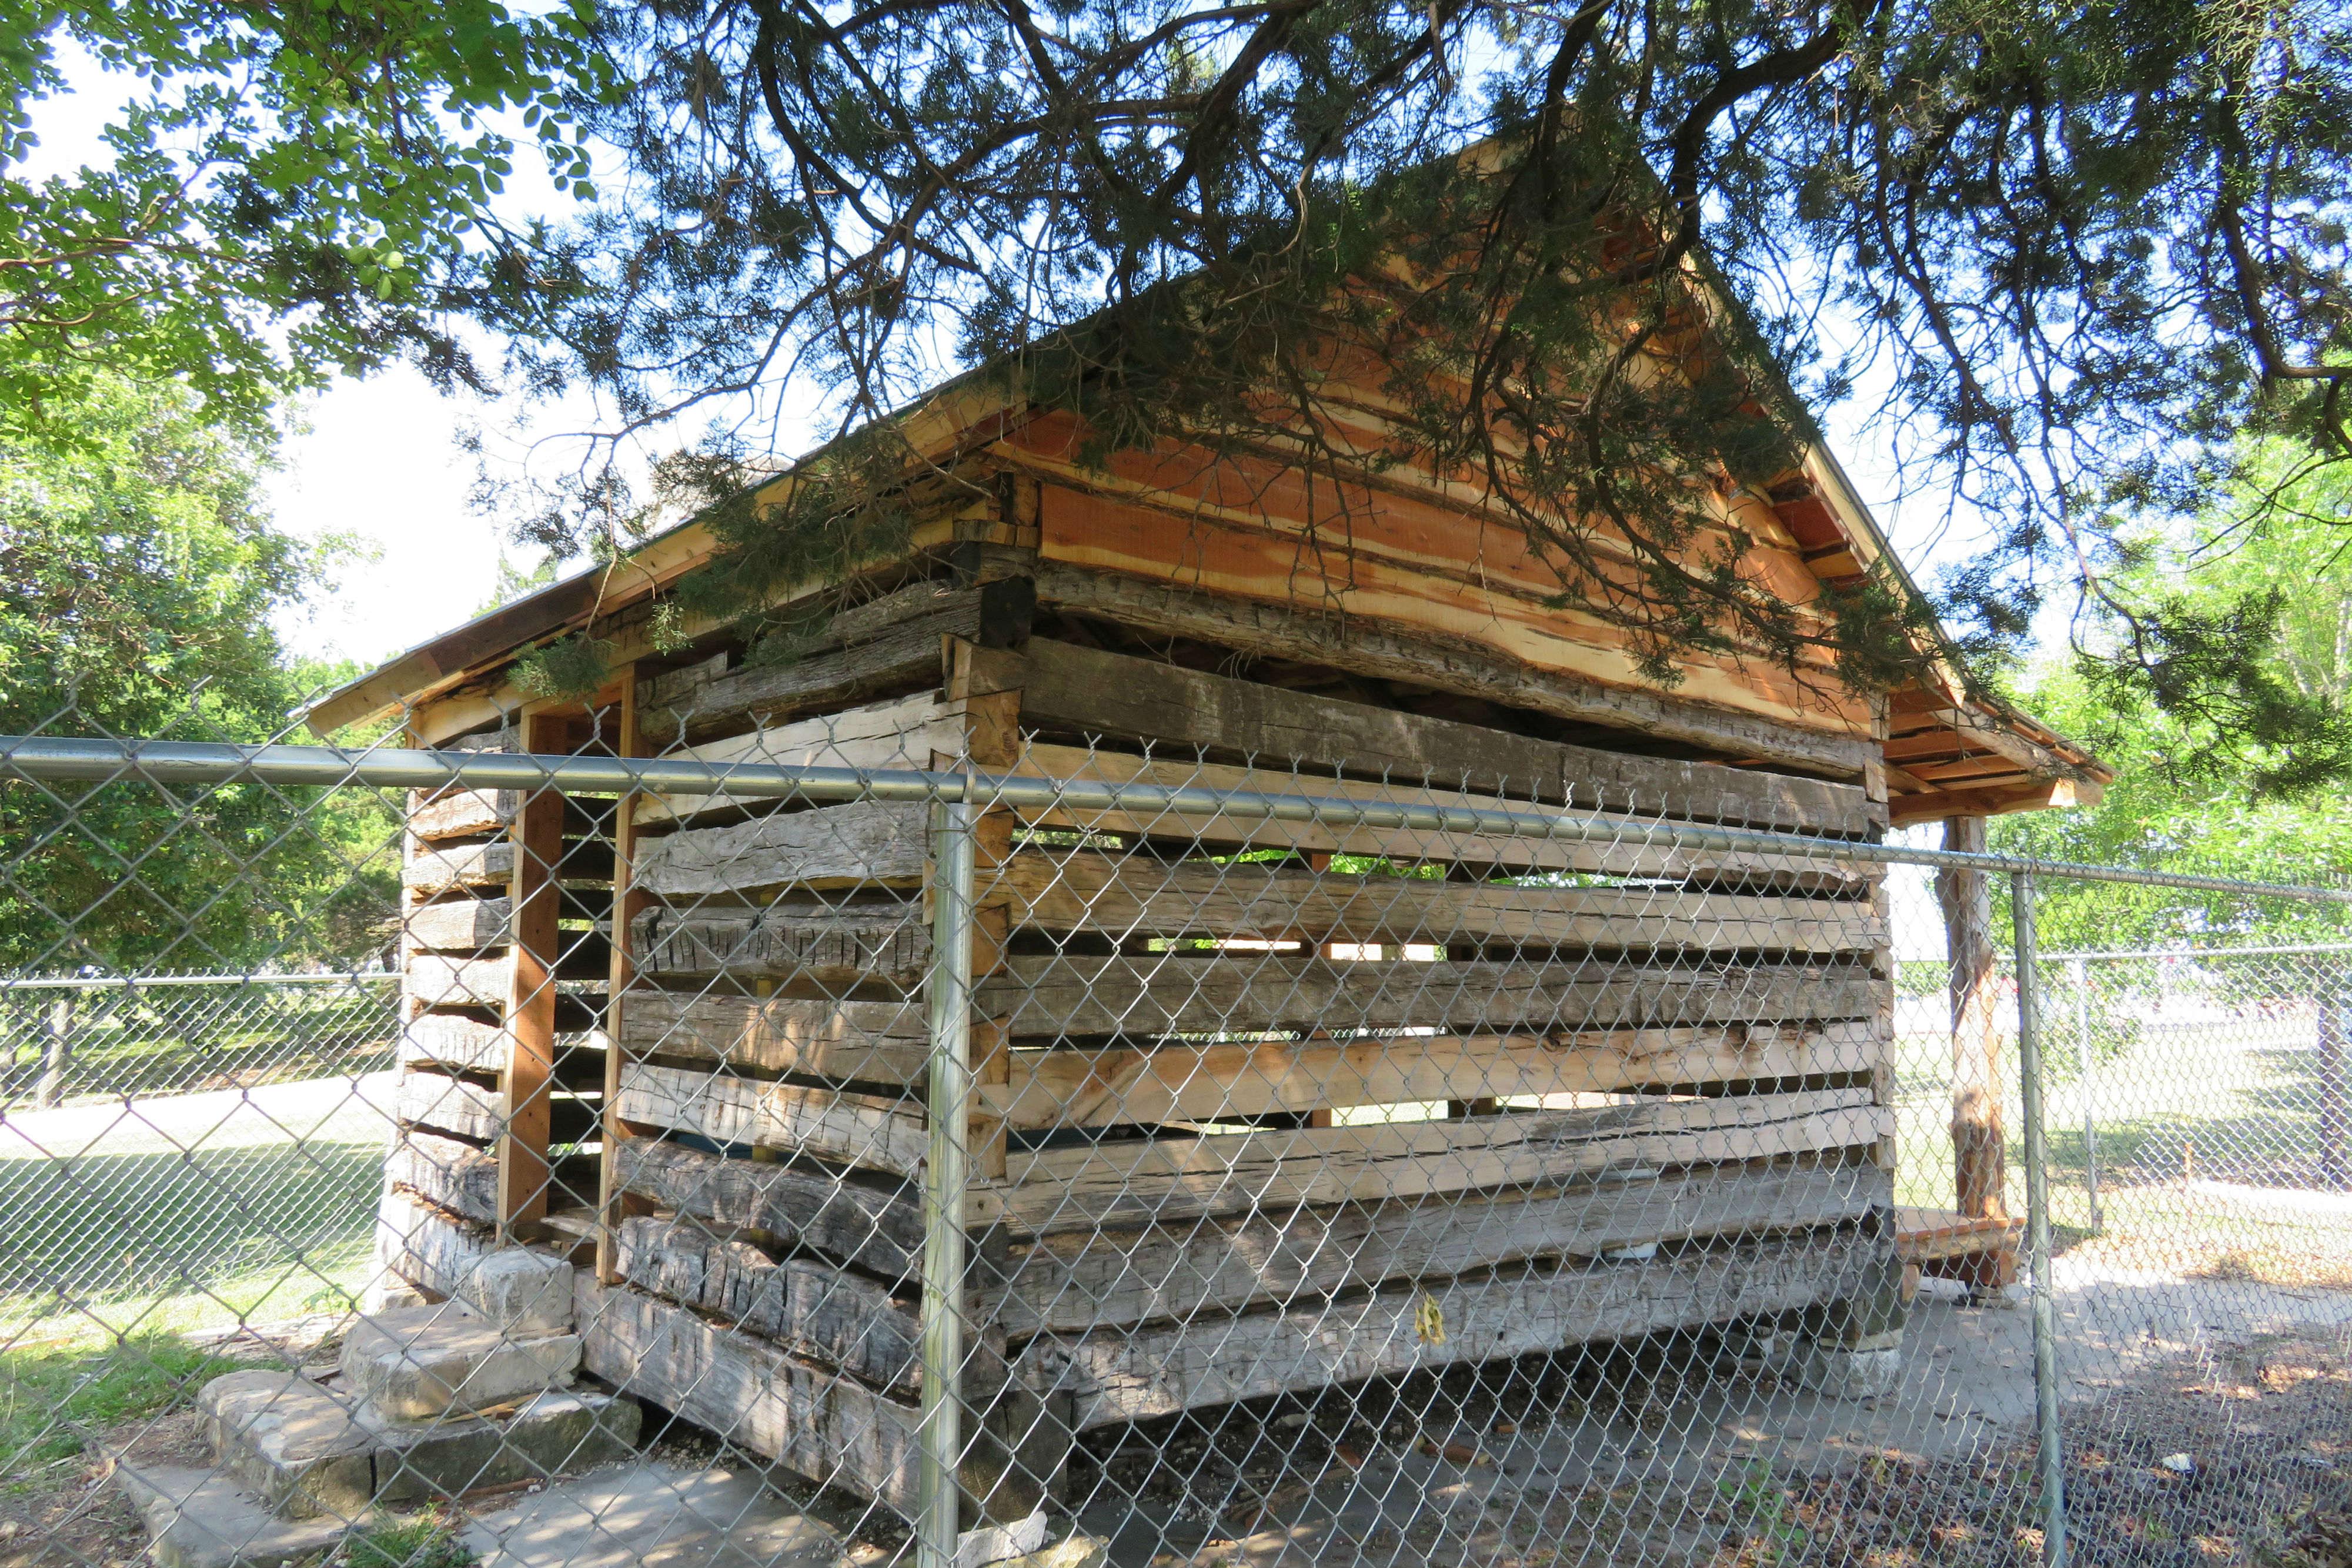 John C.G. Blackburn Cabin at Killeen Community Center